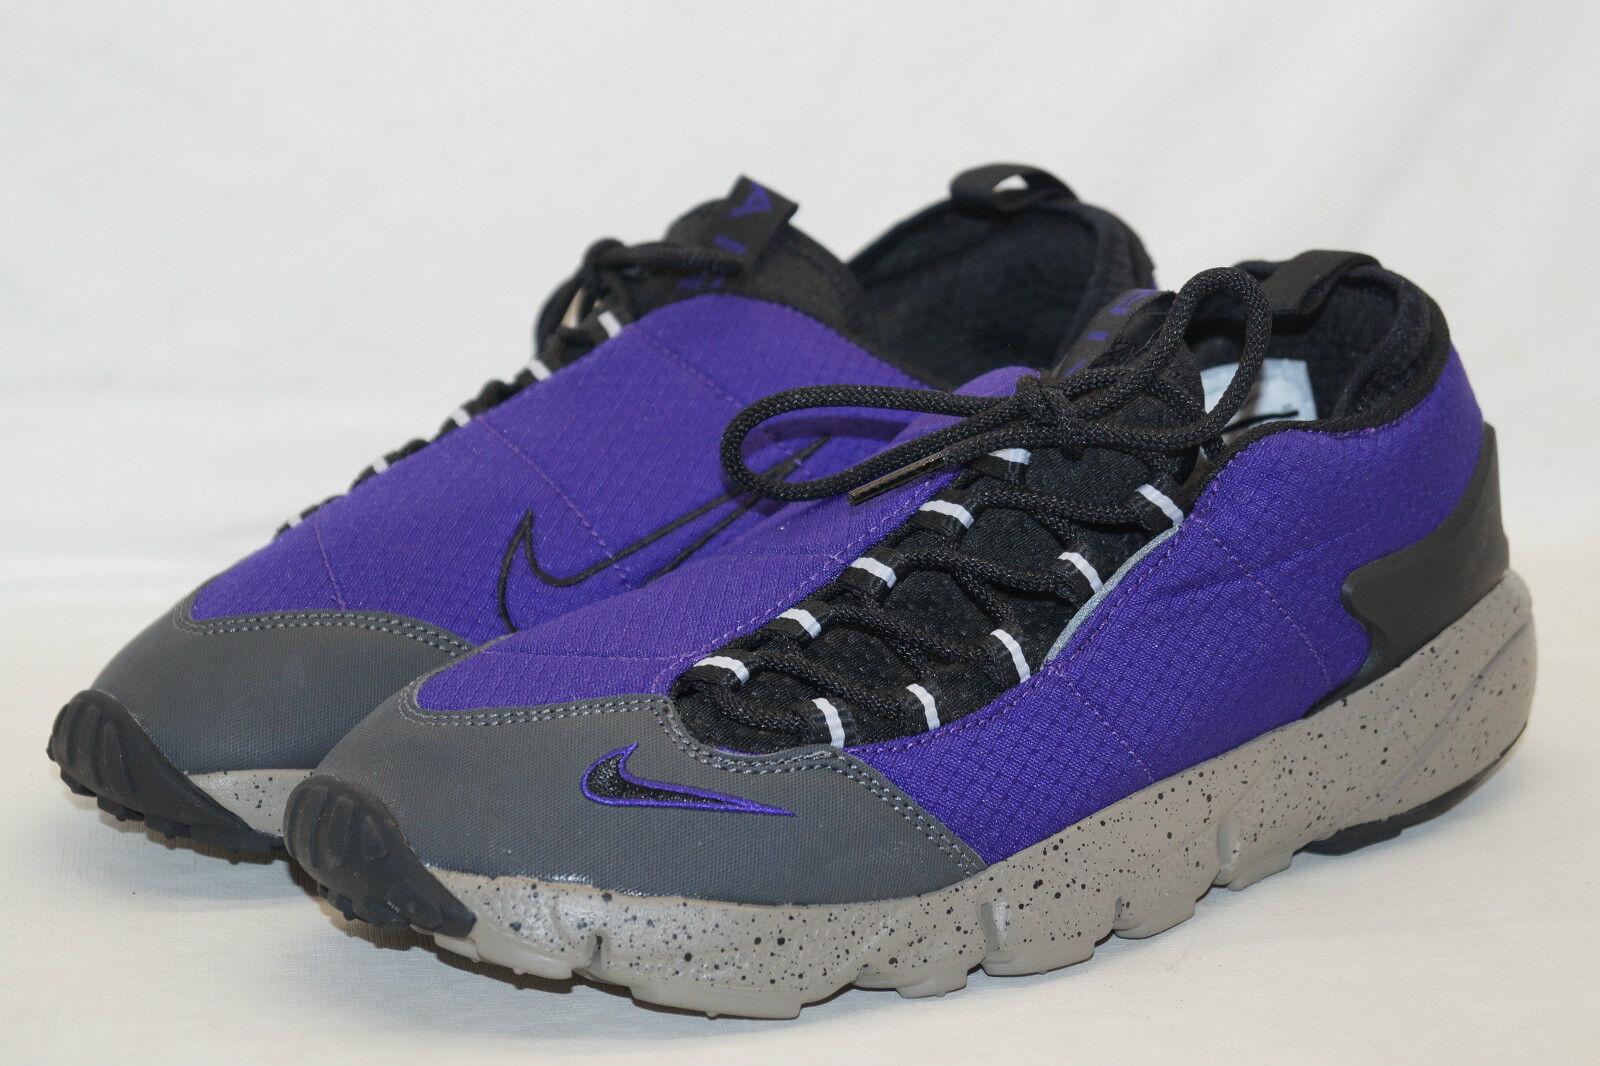 Nike  Footscape NM Court Purple Grey Size 43  online fashion shopping